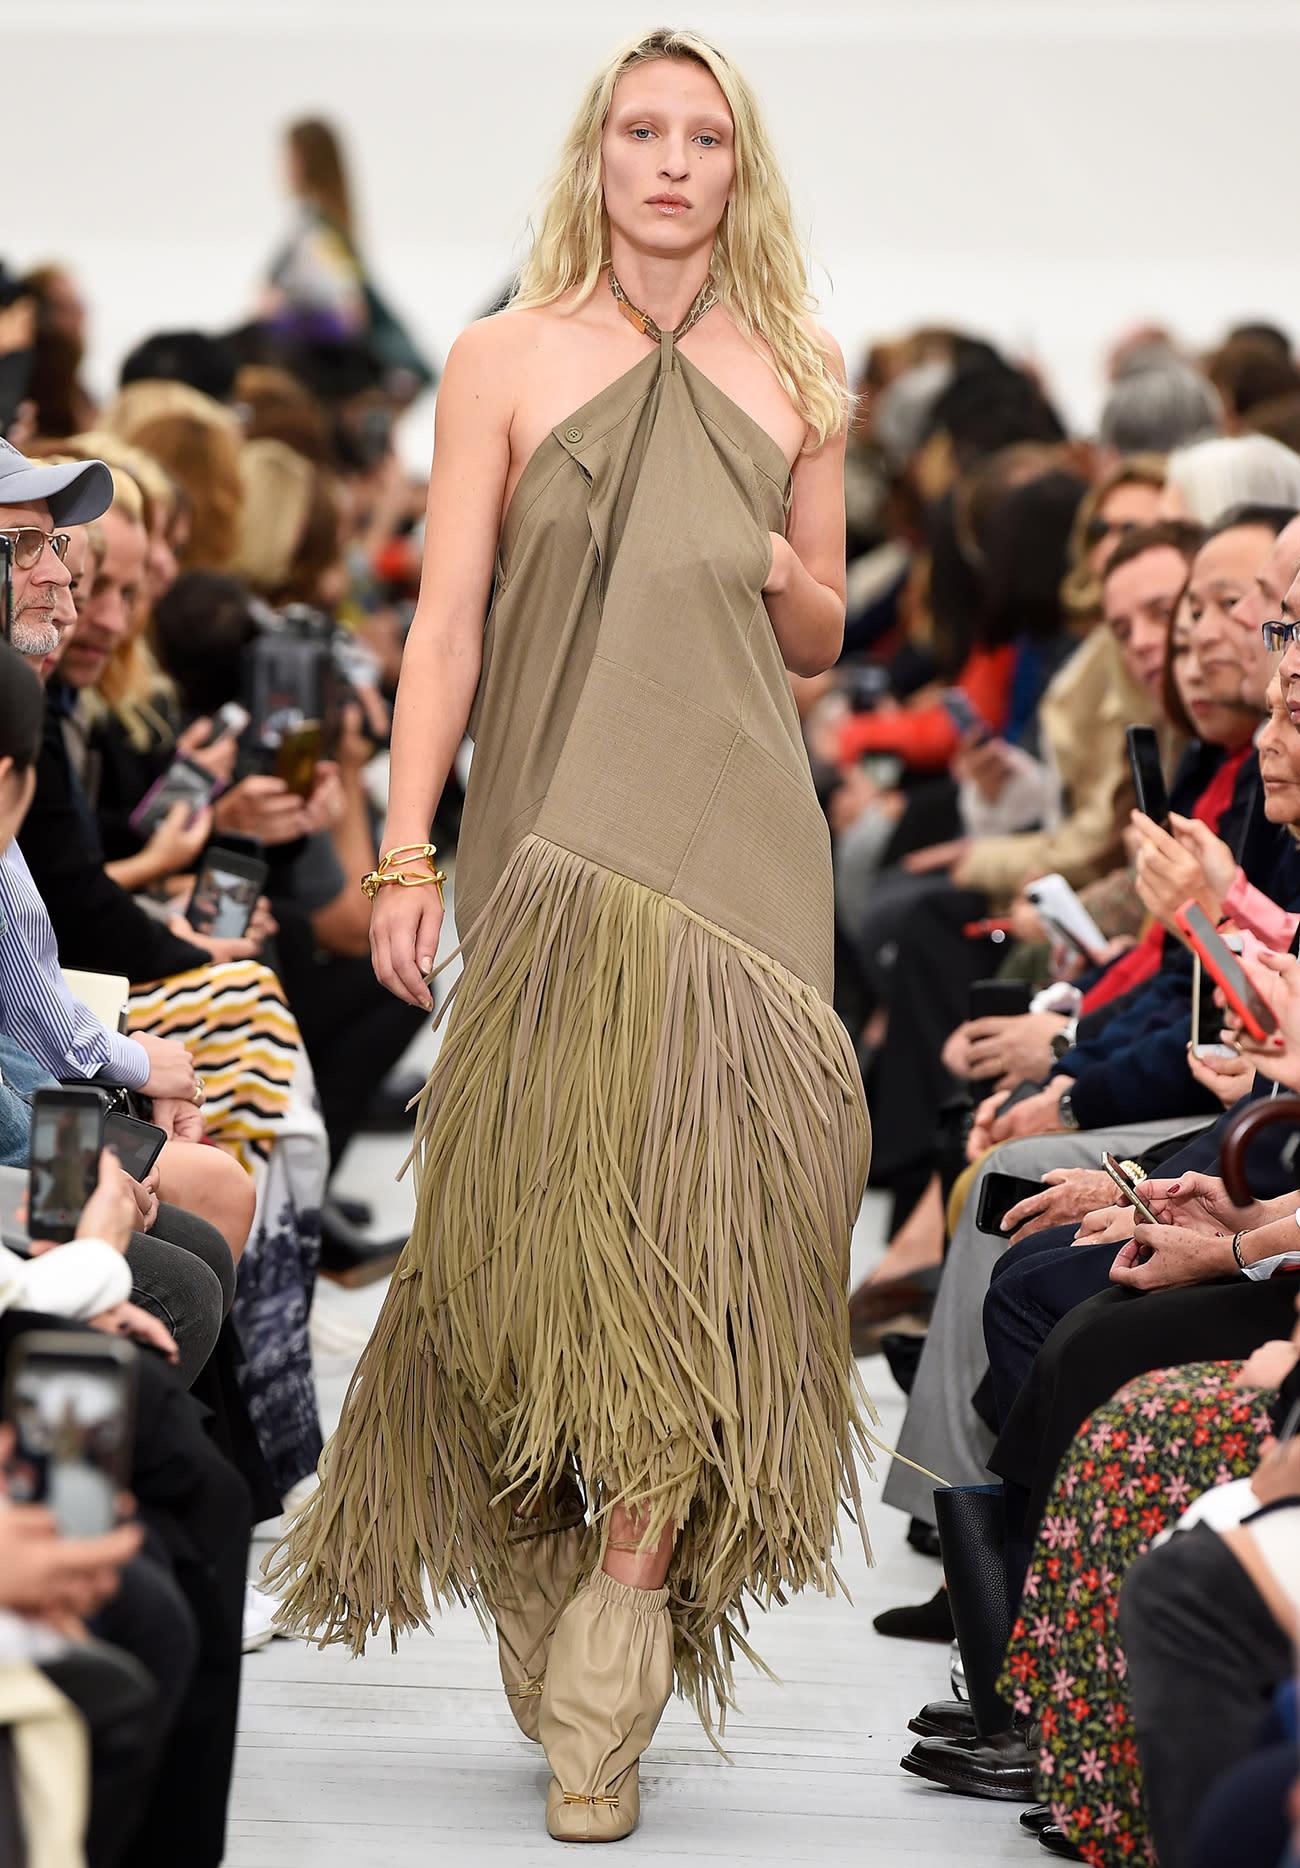 Paris Fashion Week Shows Its Bohemian Side